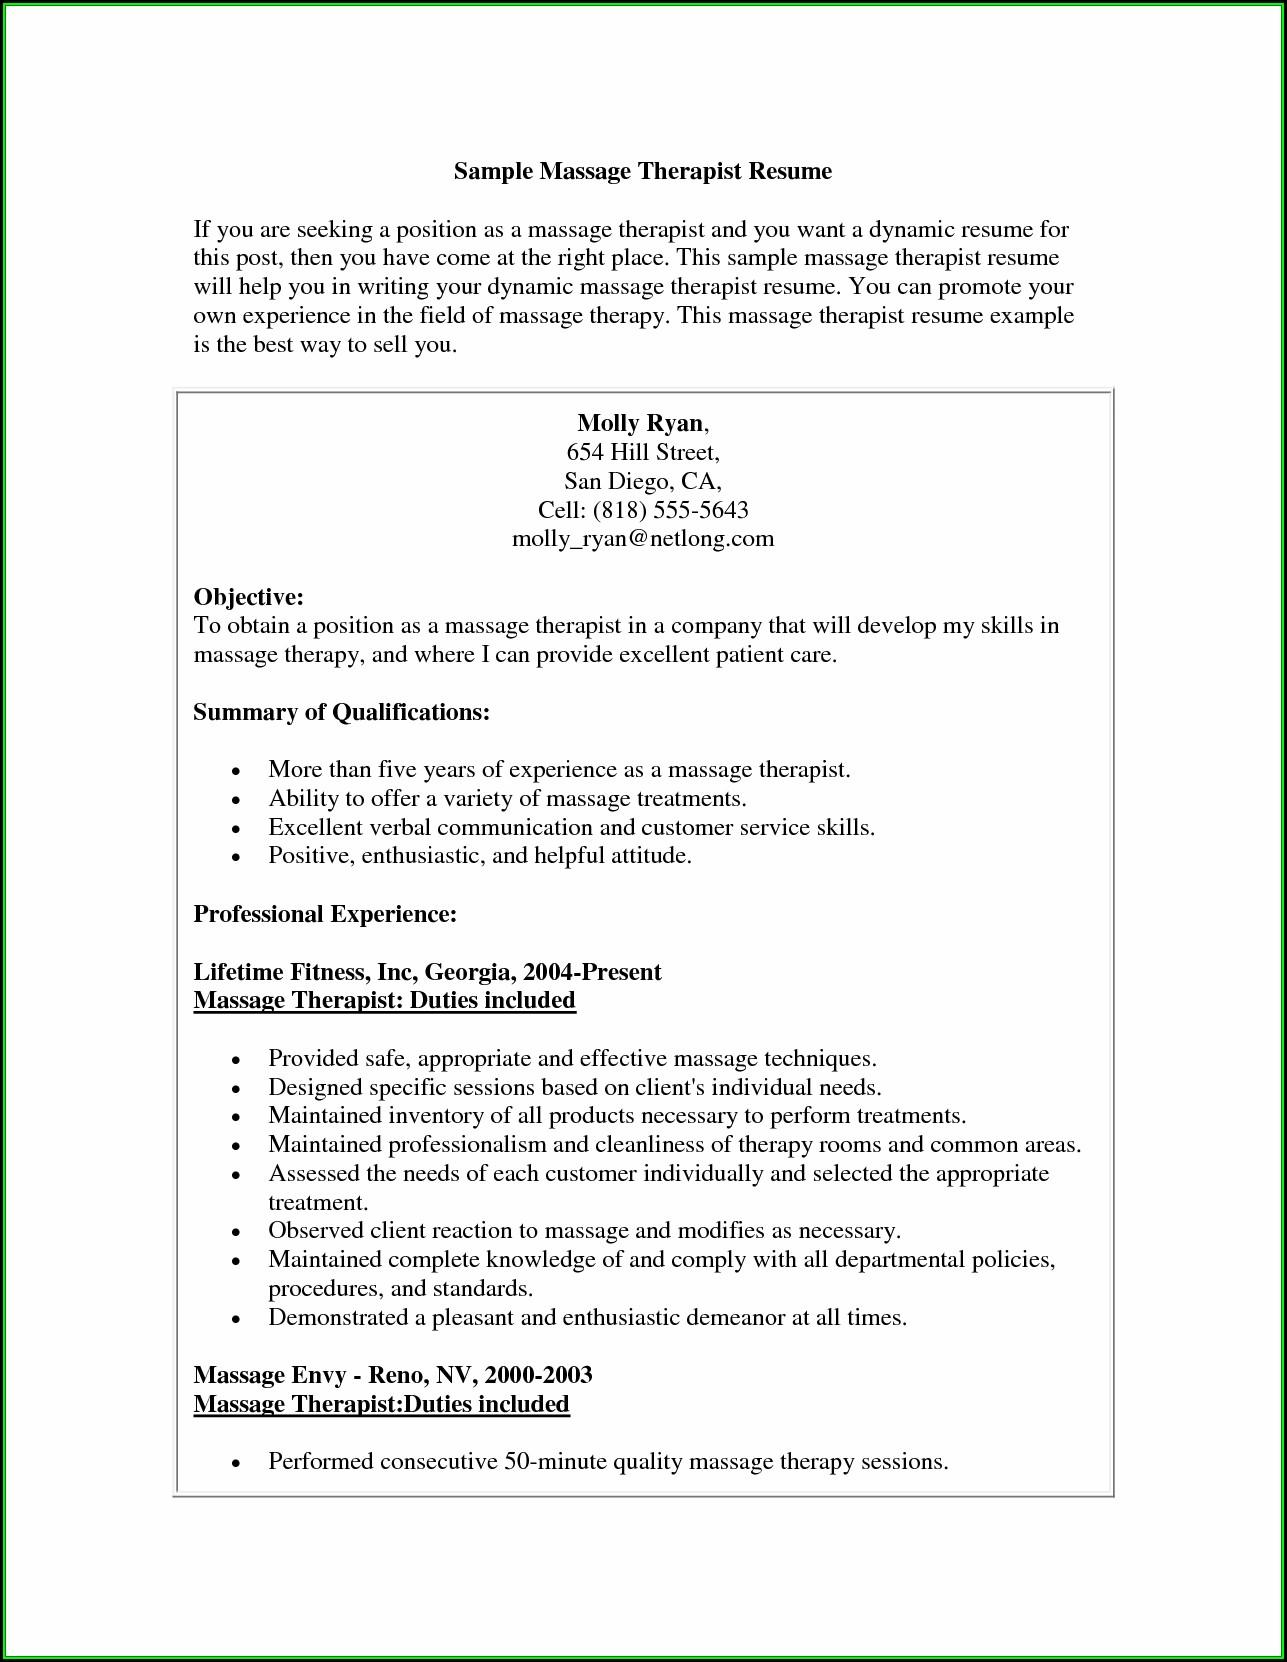 Massage Therapist Resume Objective